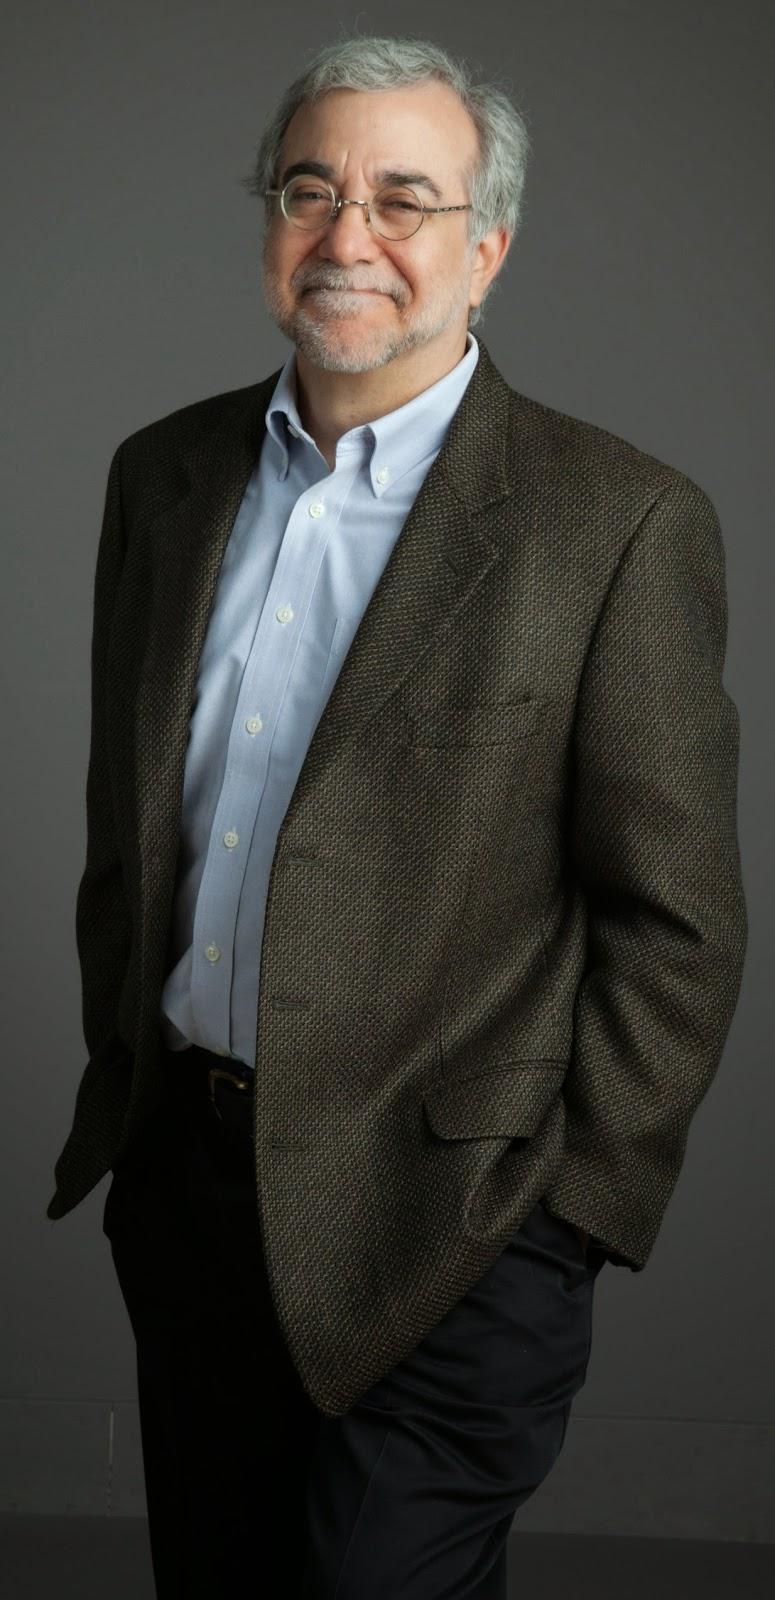 Charlie Meyerson